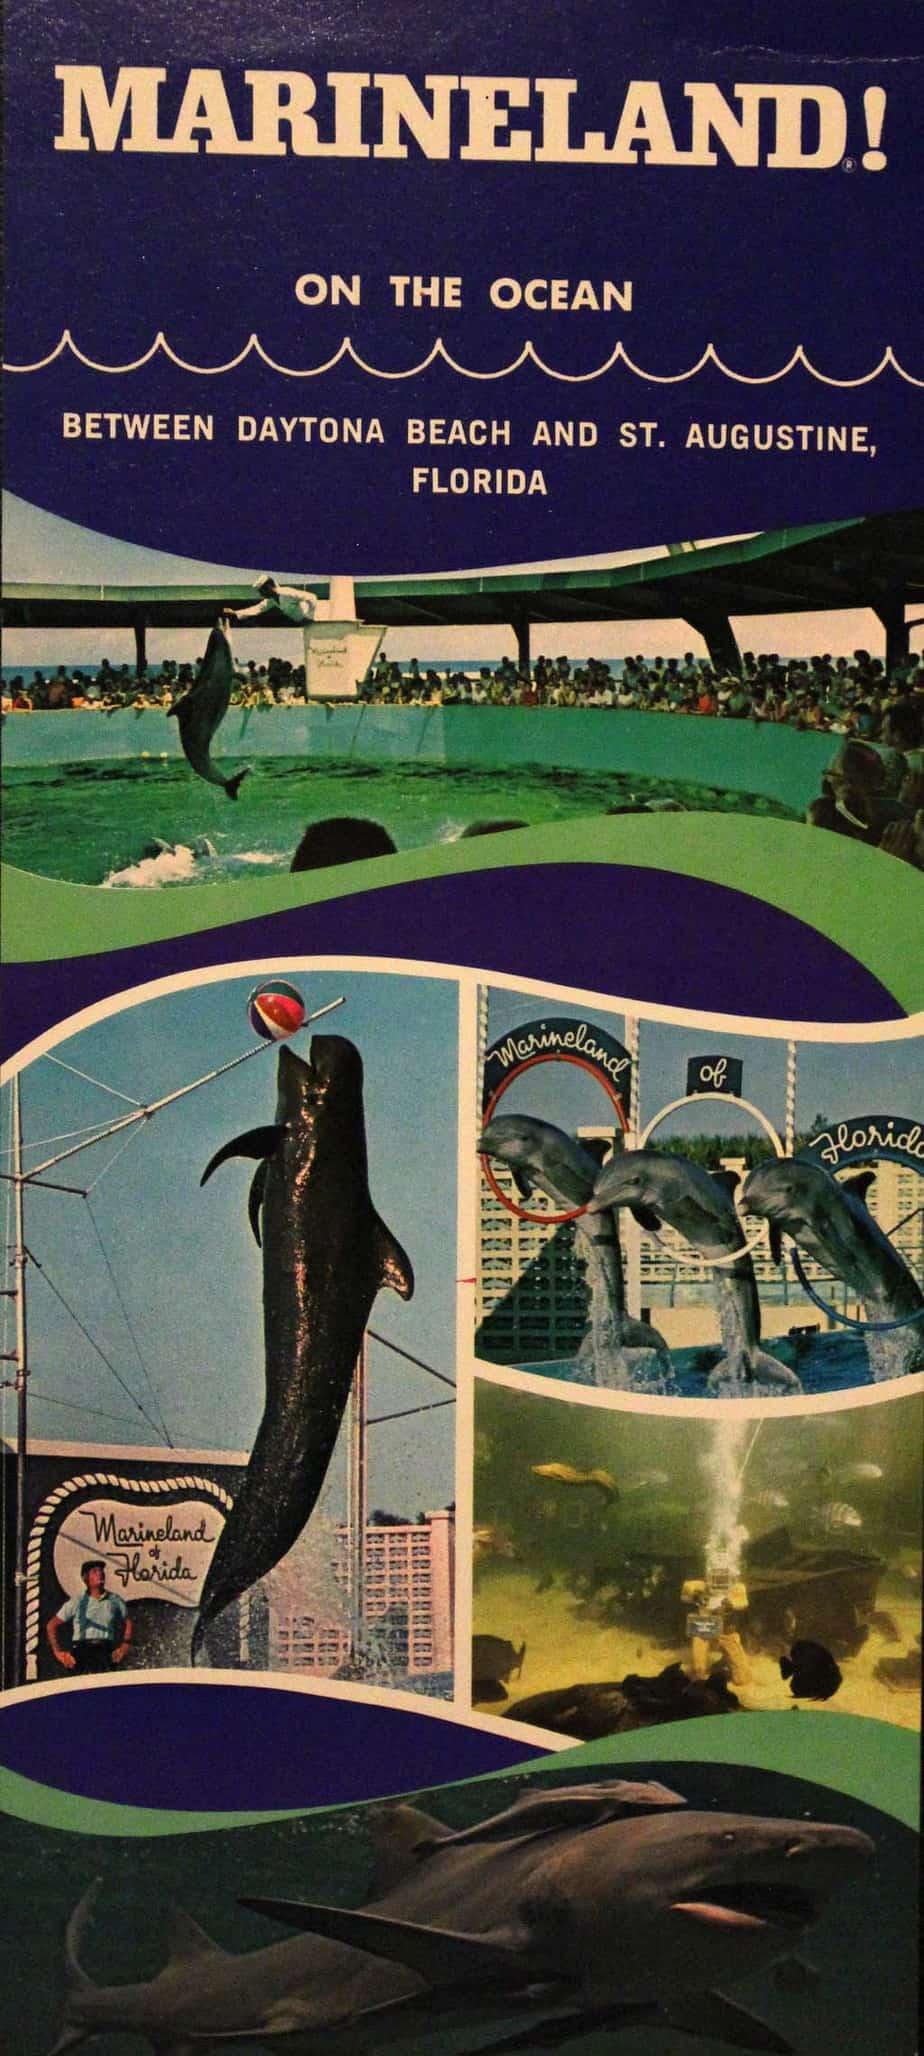 Marineland A Legendary Oceanarium Continually Reinvents Itself Florida Rambler